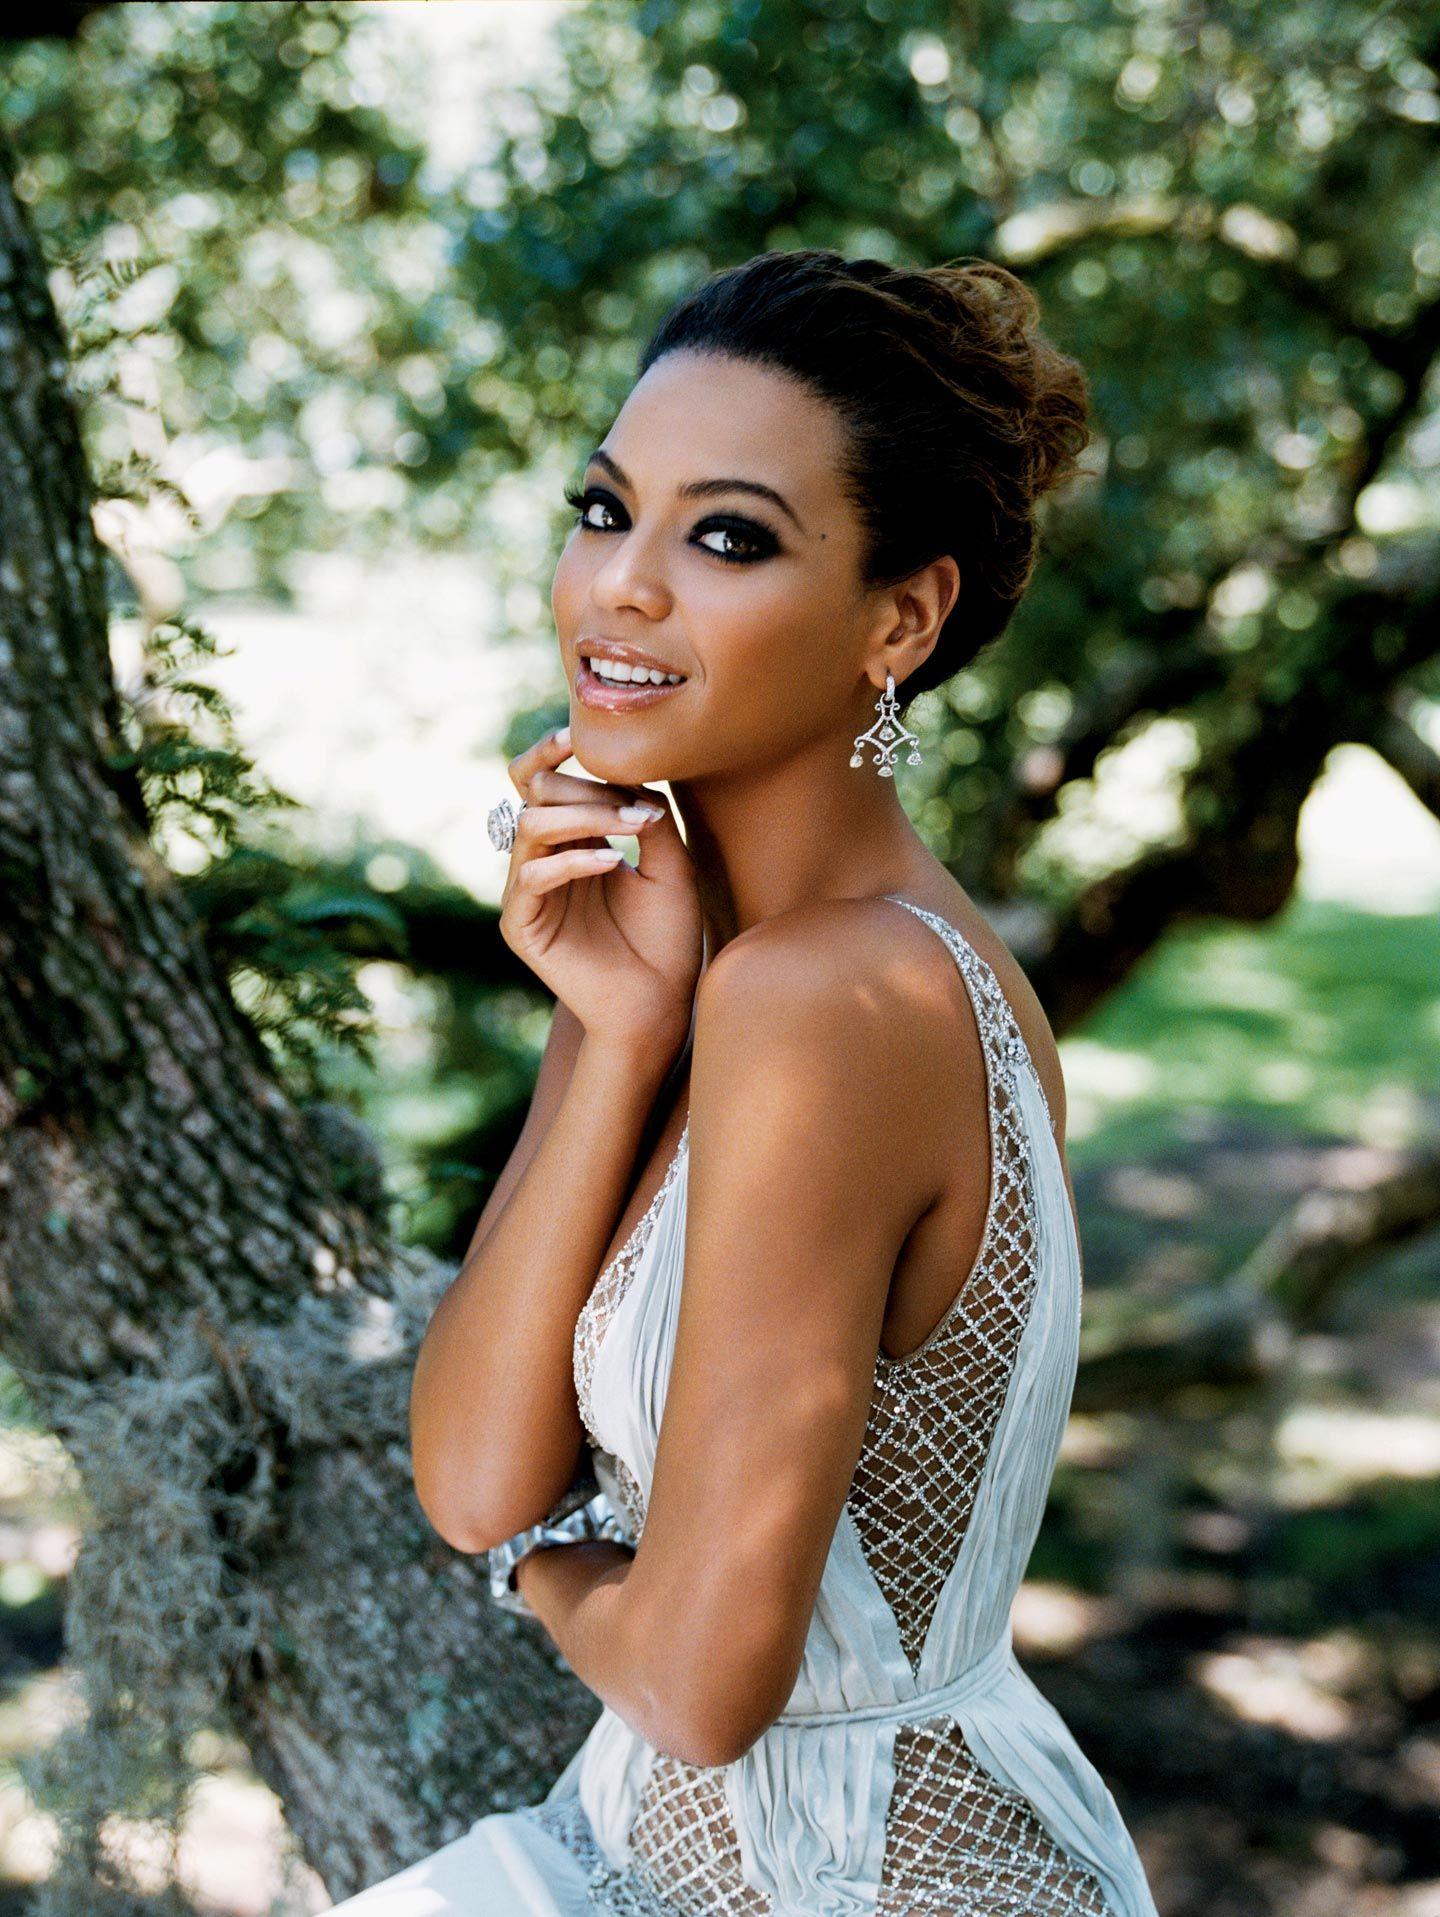 Beyonce Elegant Updo Bun Hairstyle Bridal Makeup Makeup And Queens